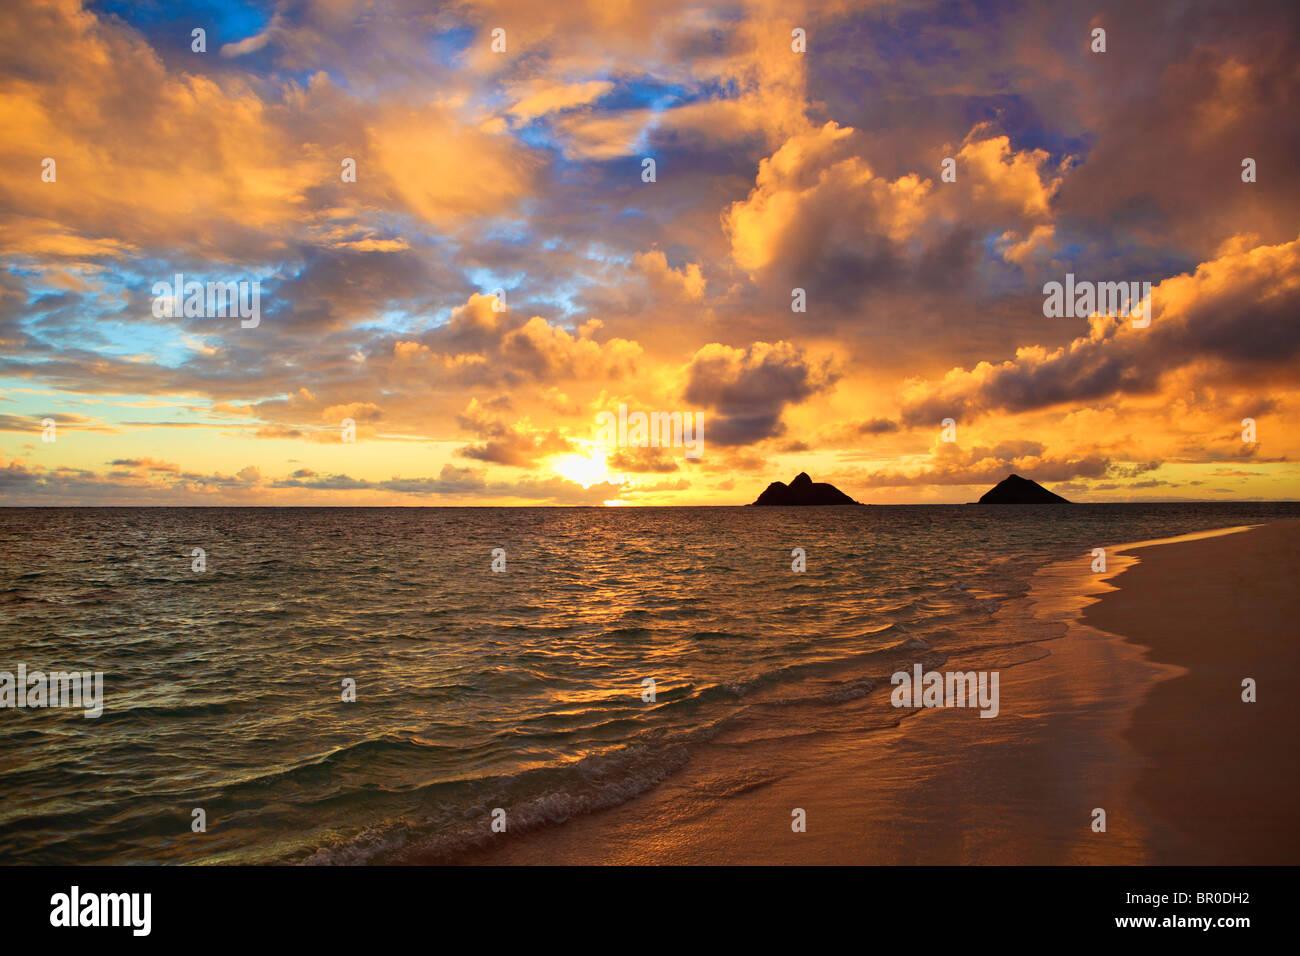 September-Sonnenaufgang über den Mokulua Inseln in Lanikai, Hawaii Stockbild